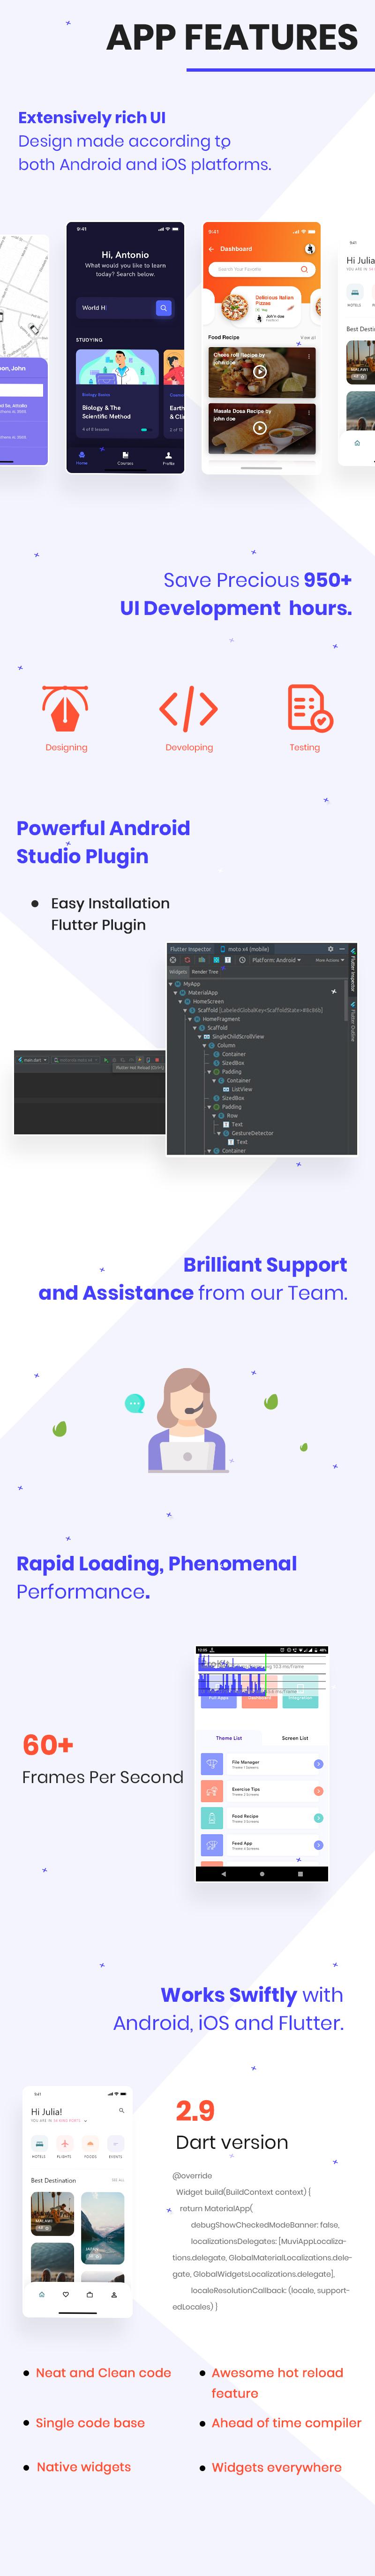 Best Flutter UI Templates | Prokit | Iqonic Design biggest flutter 2.0 ui kit ProKit app features1